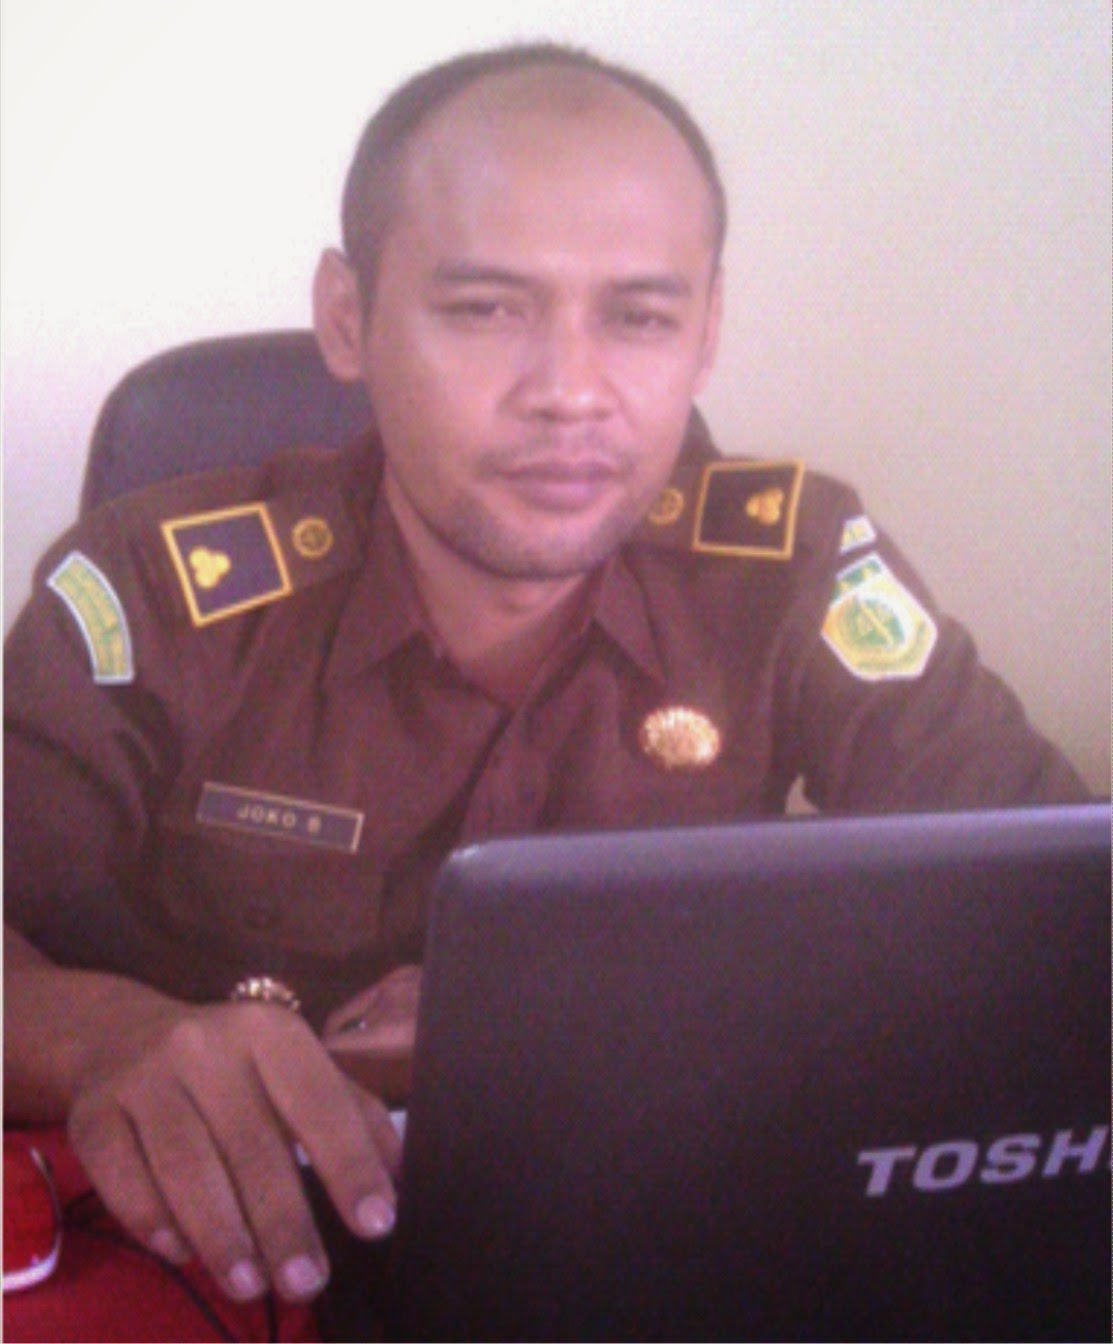 Terdakwa Divonis Berbeda, JPU Banding